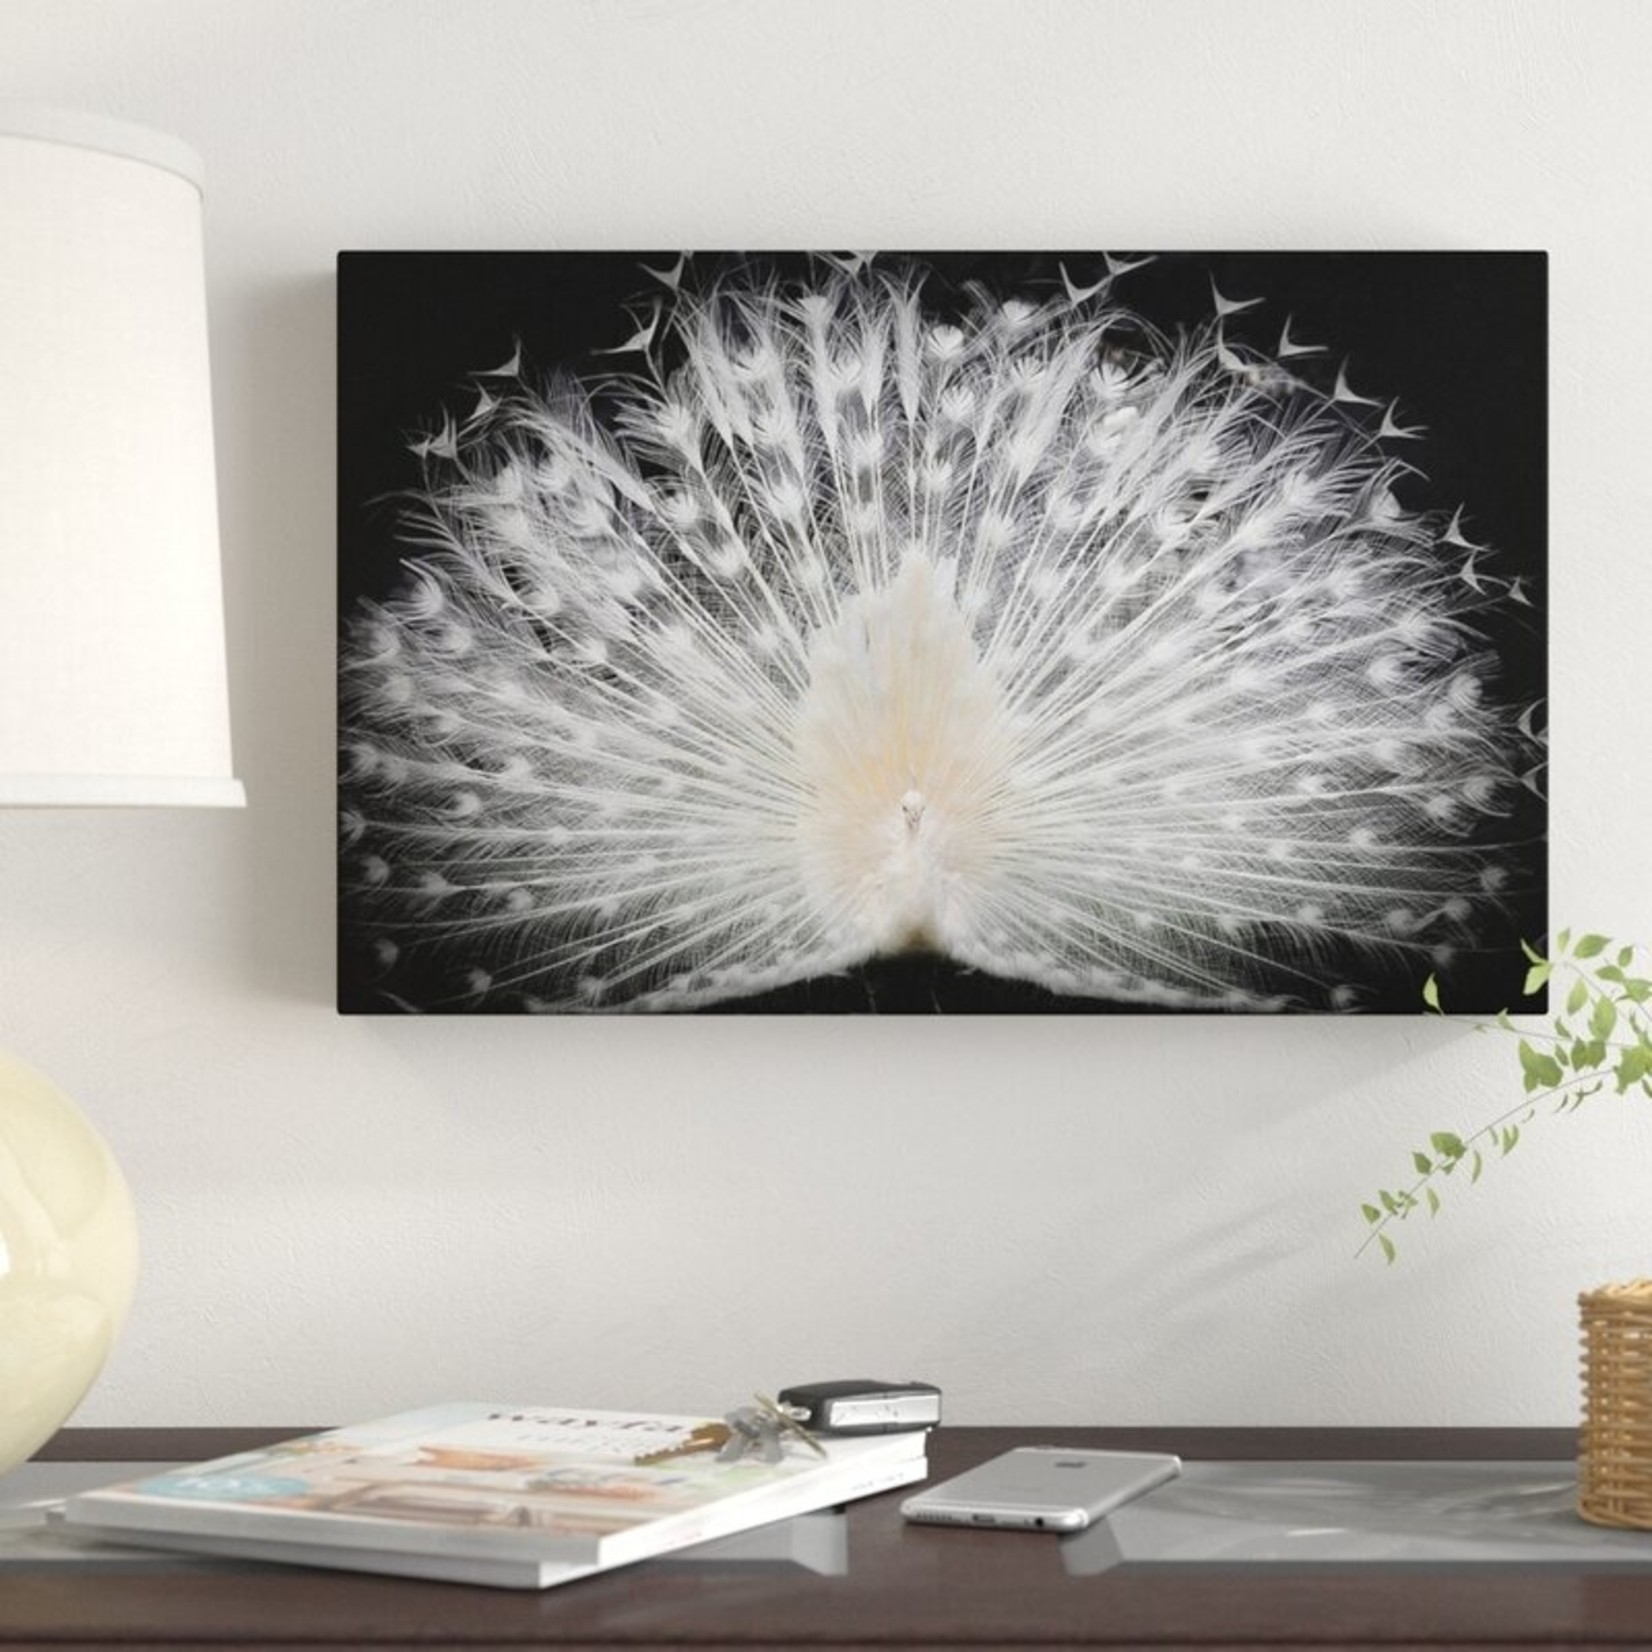 "*22"" x 32"" - White Peacock Portrait Photographic Print on Canvas"